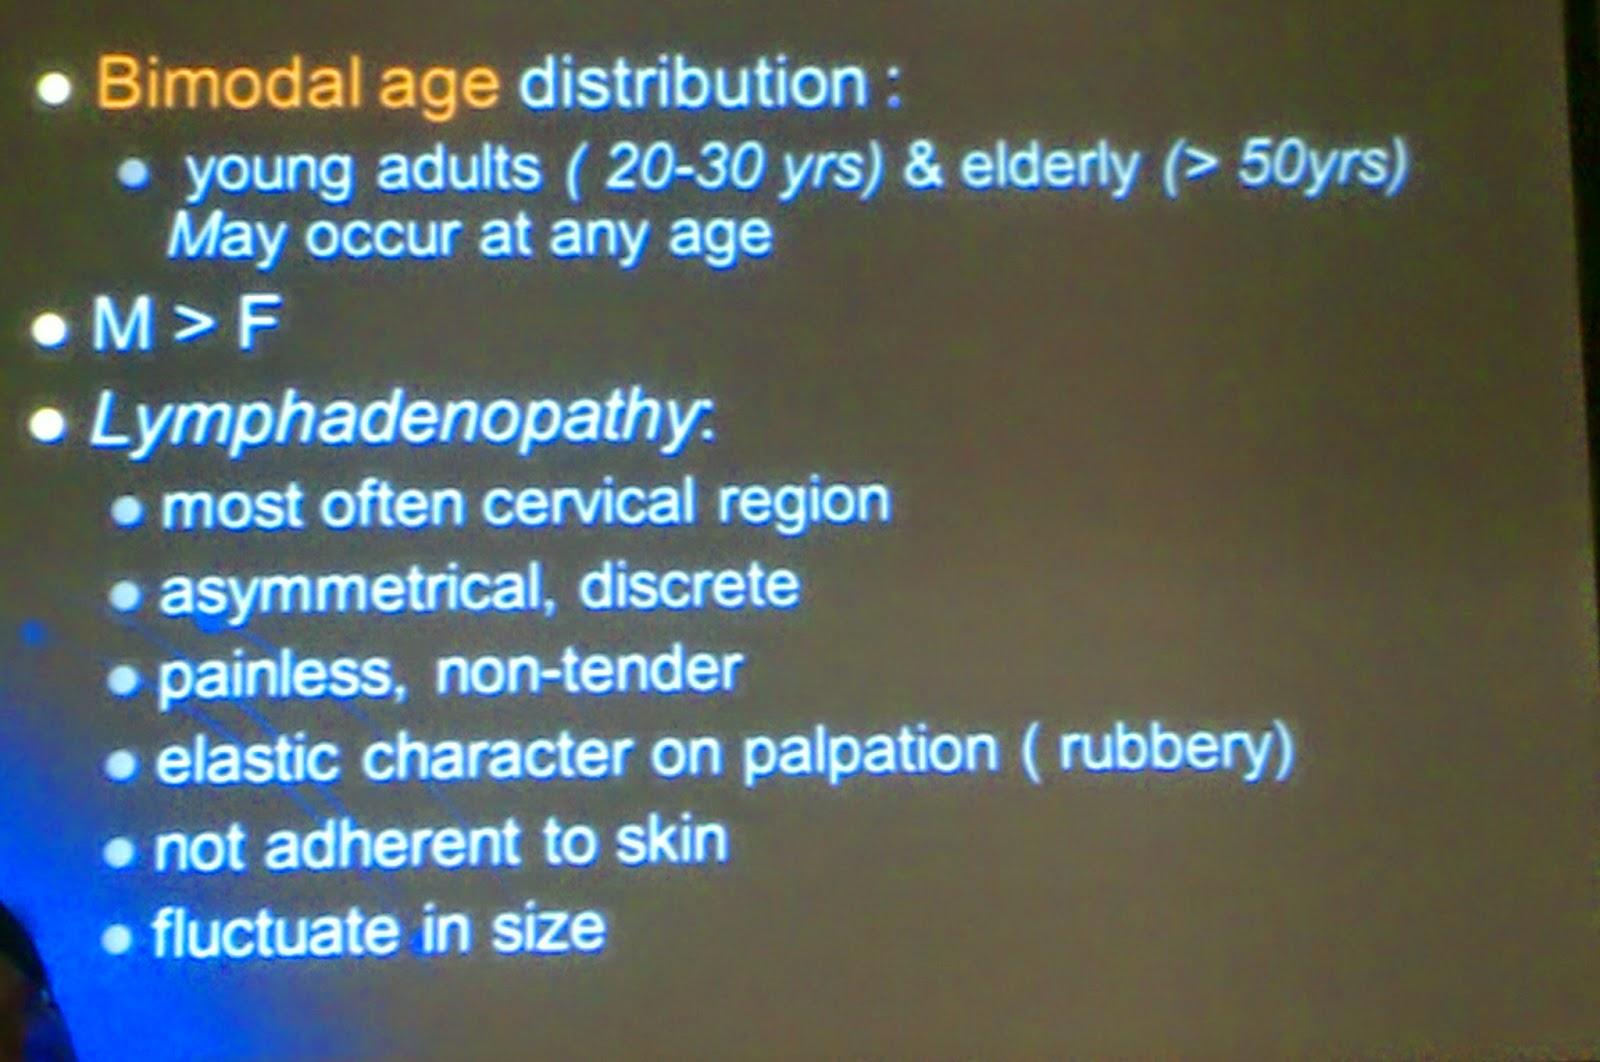 hodgkins lymphoma research paper